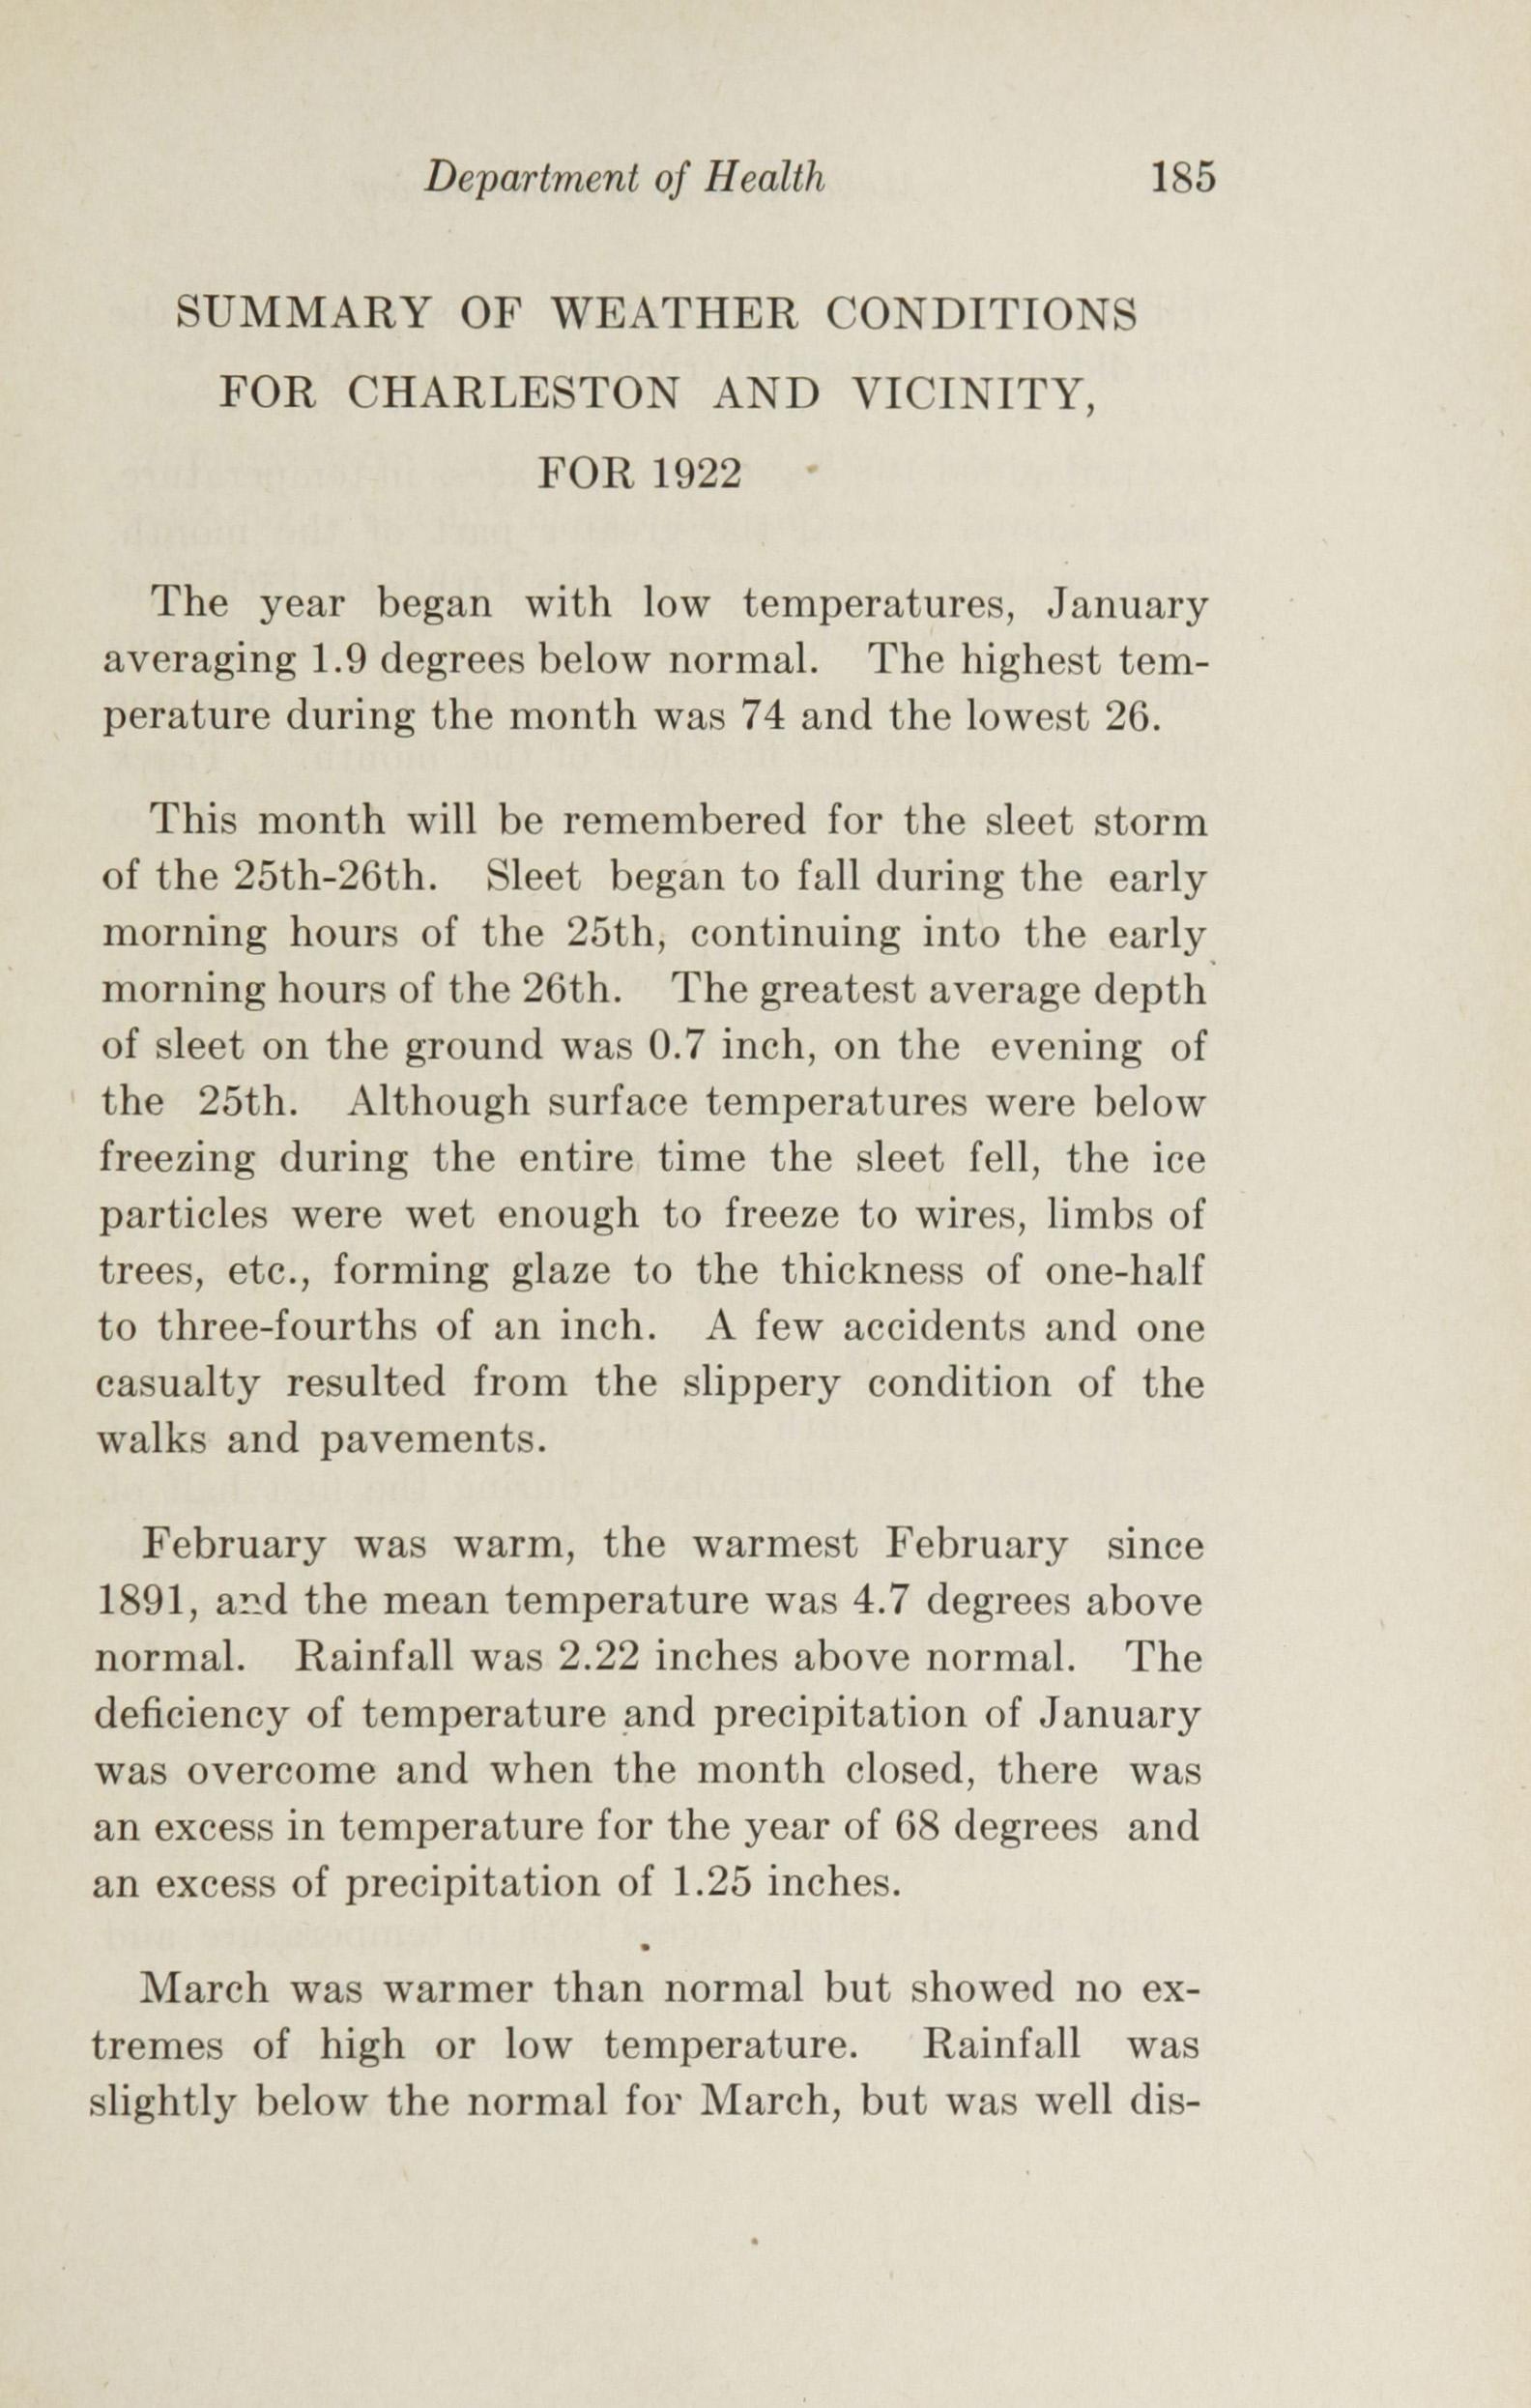 Charleston Yearbook, 1922, page 185